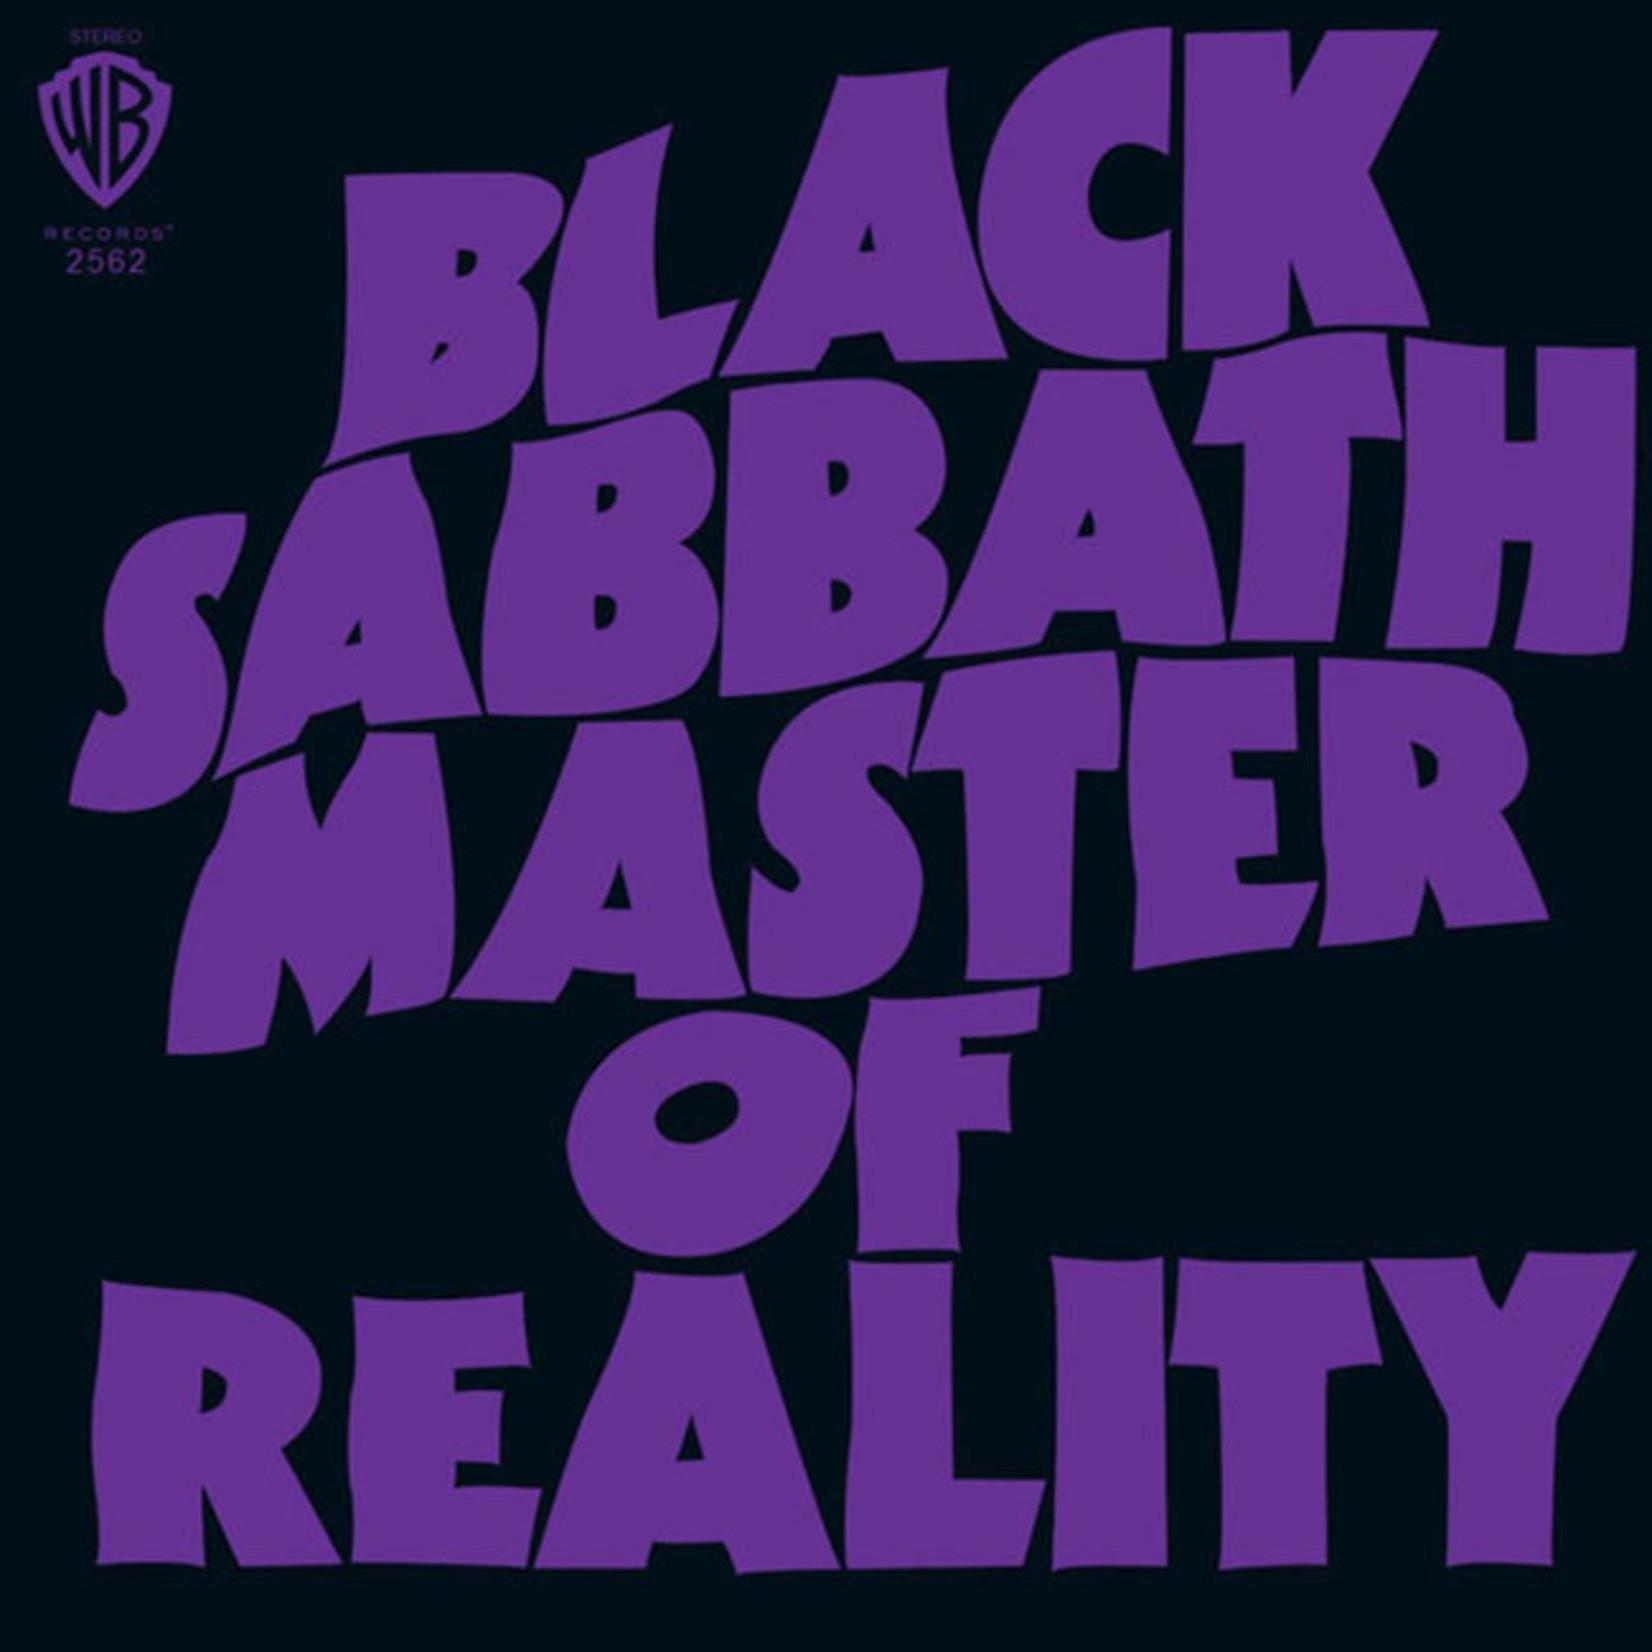 [New] Black Sabbath: Master Of Reality